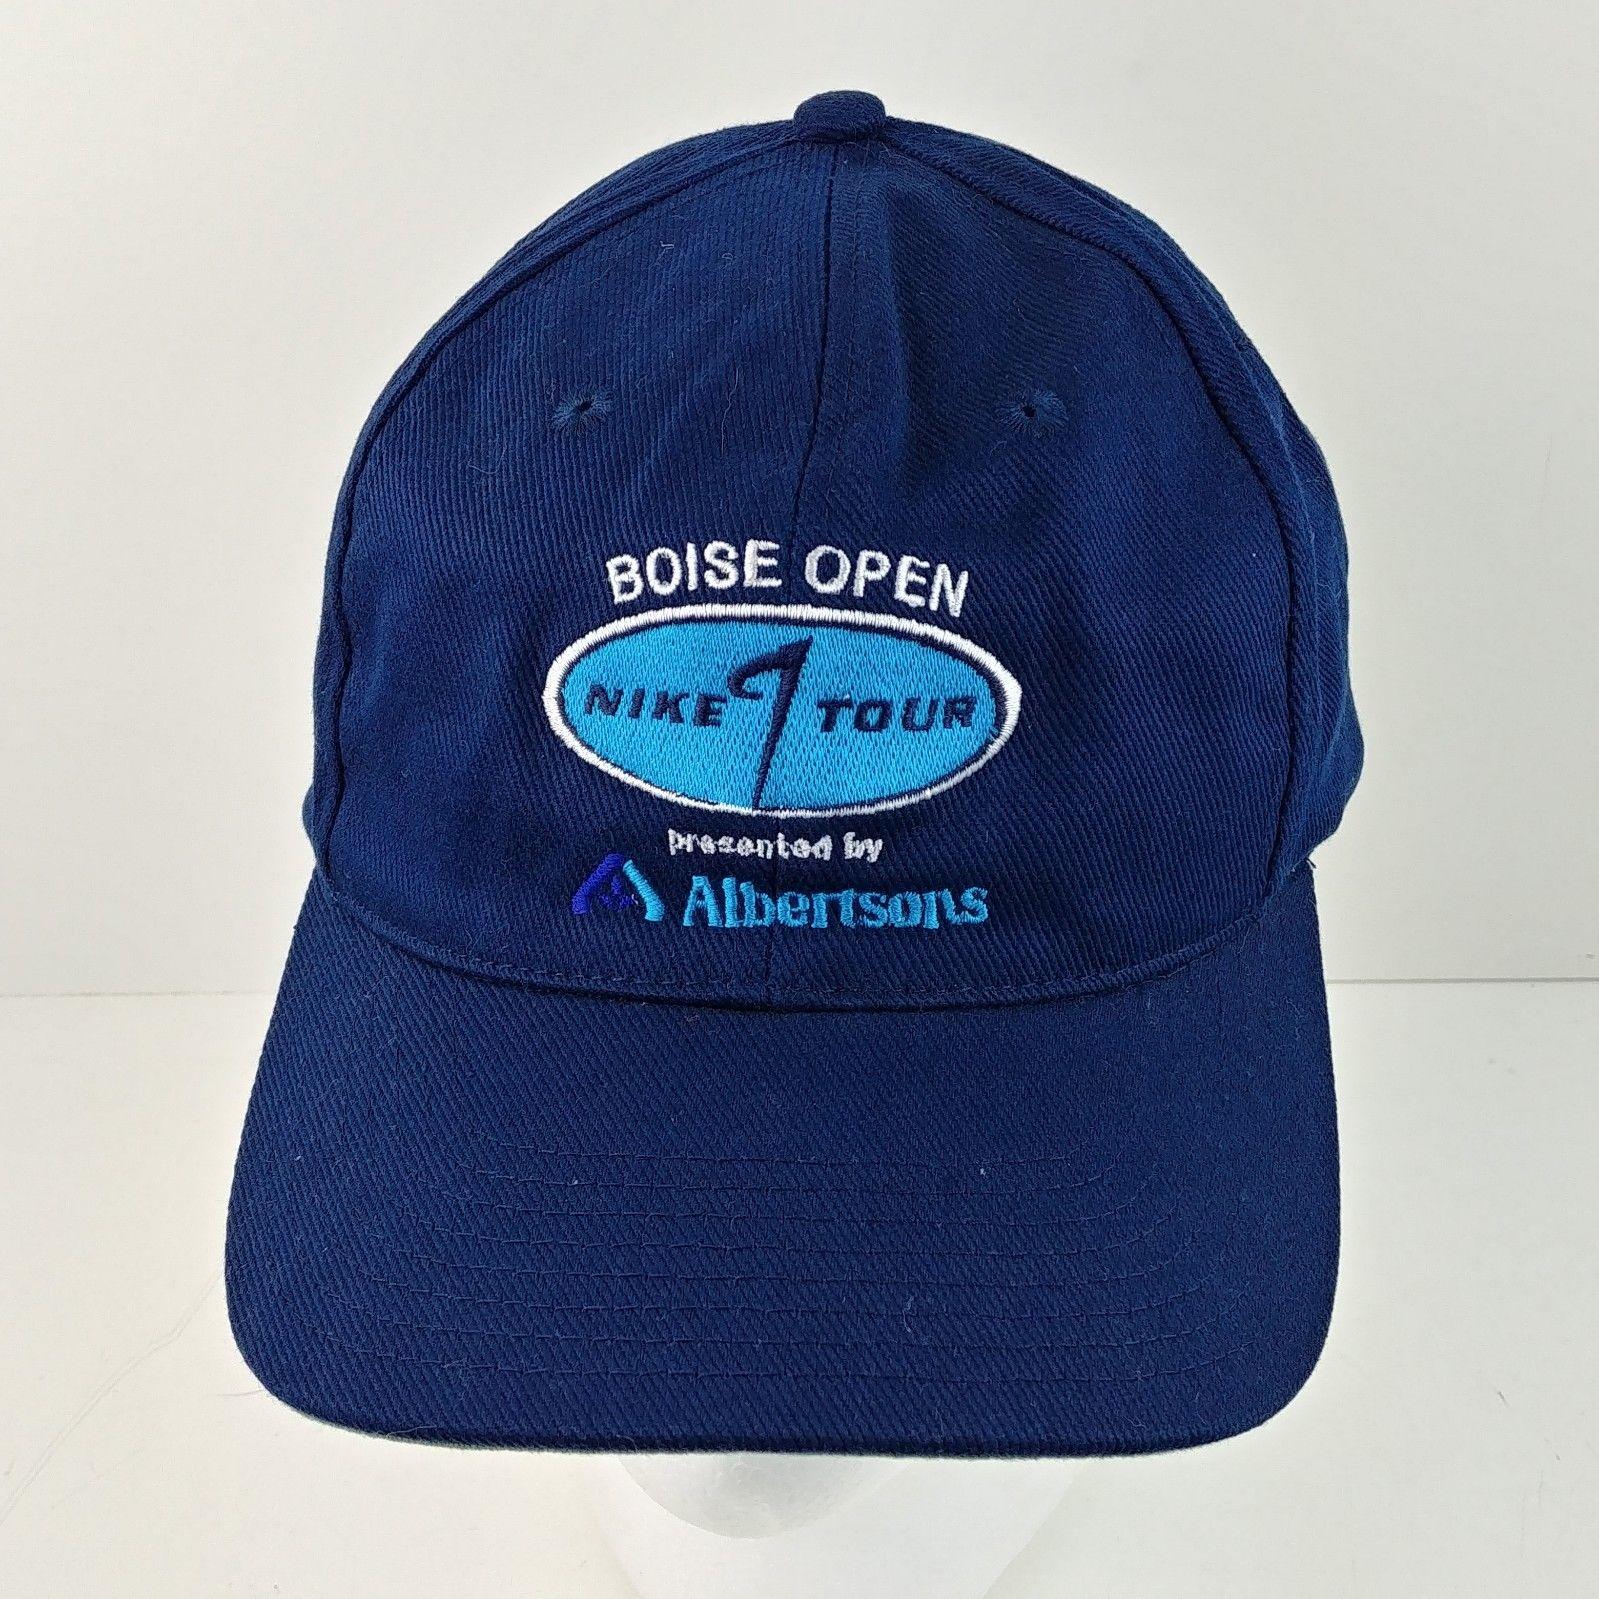 lc Nike Golf Hat 550634-451 w  Tag Boise OPEN Snapback Baseball Cap ... 628244a3649c